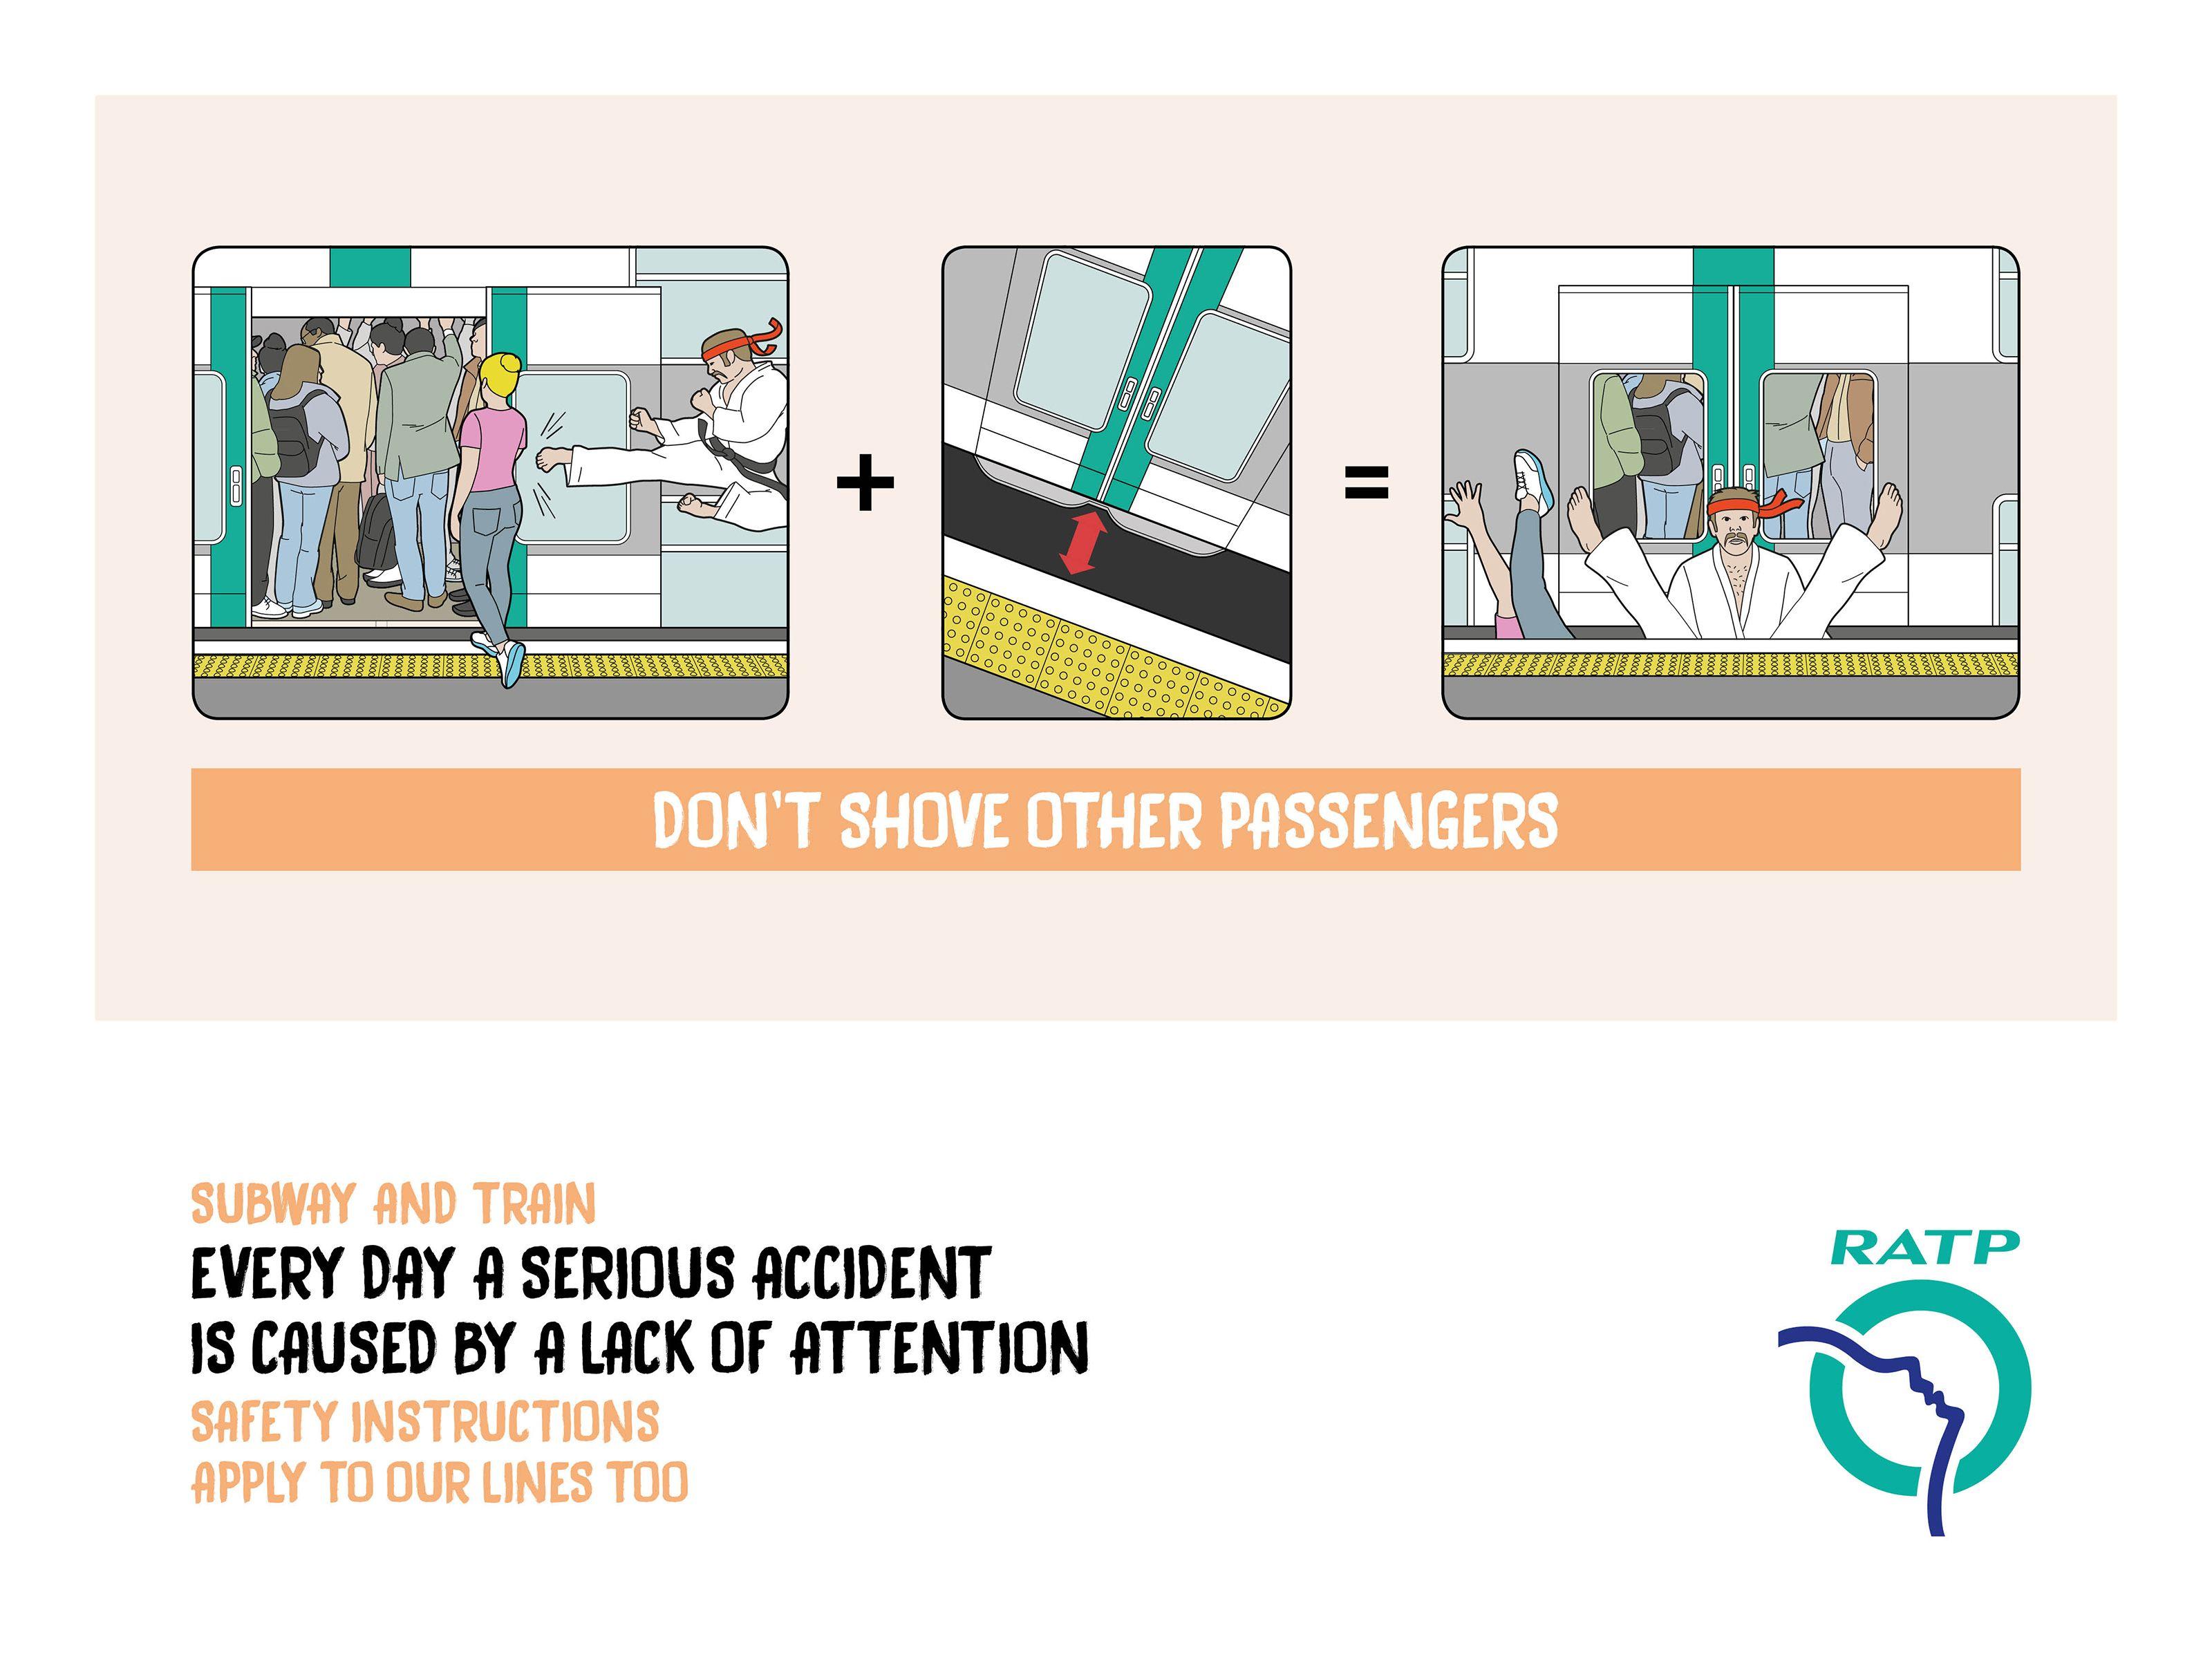 RATP: Safety instructions 3